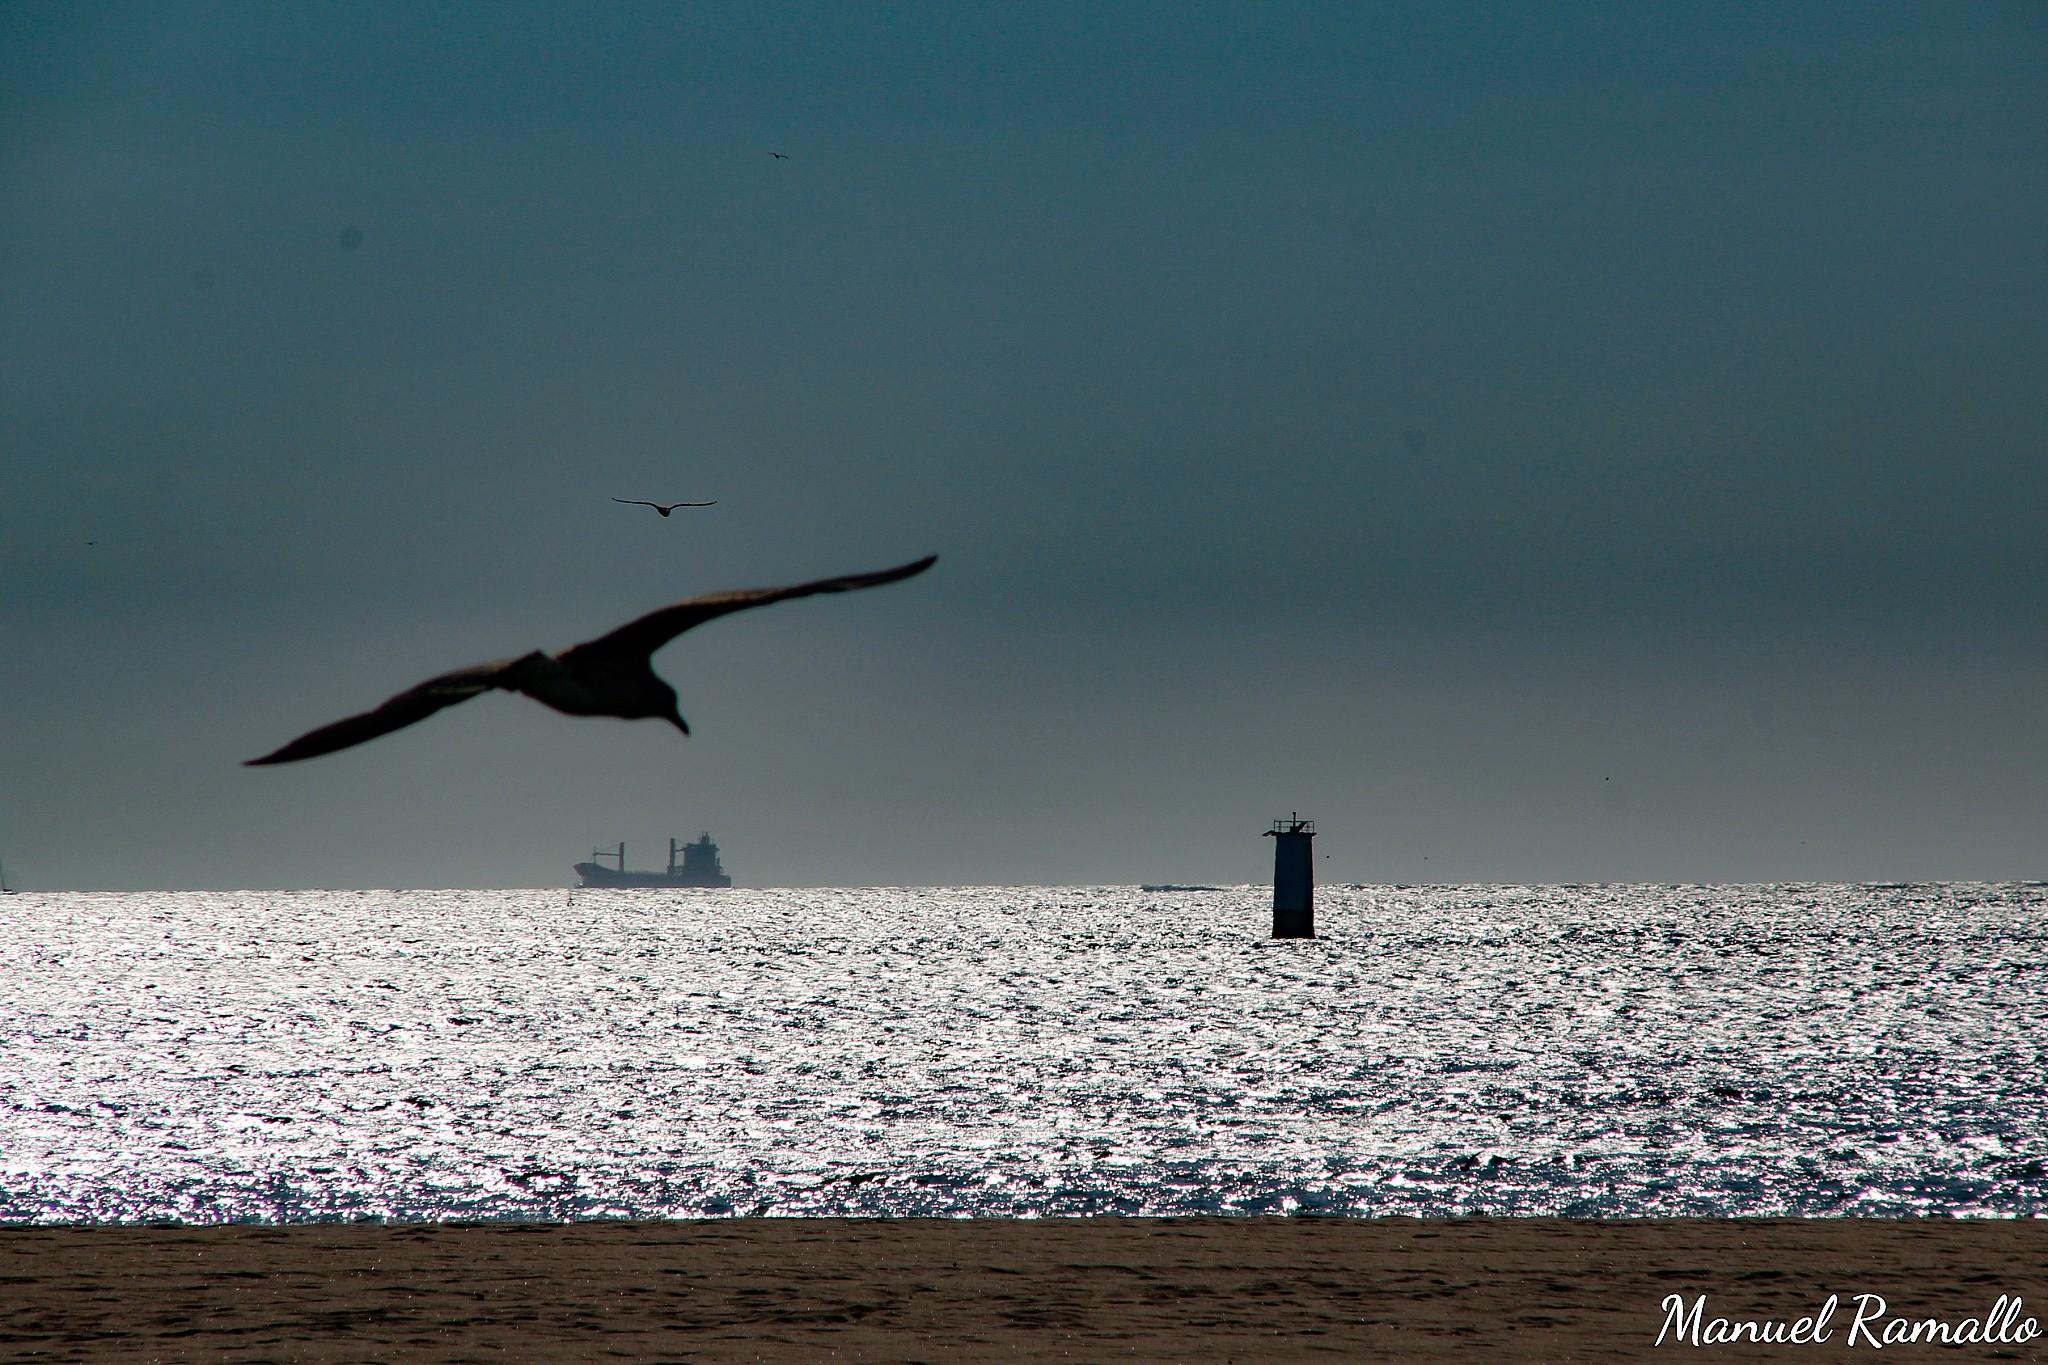 atardecer-en-el-mar-playa-america-nigran-pontevedra